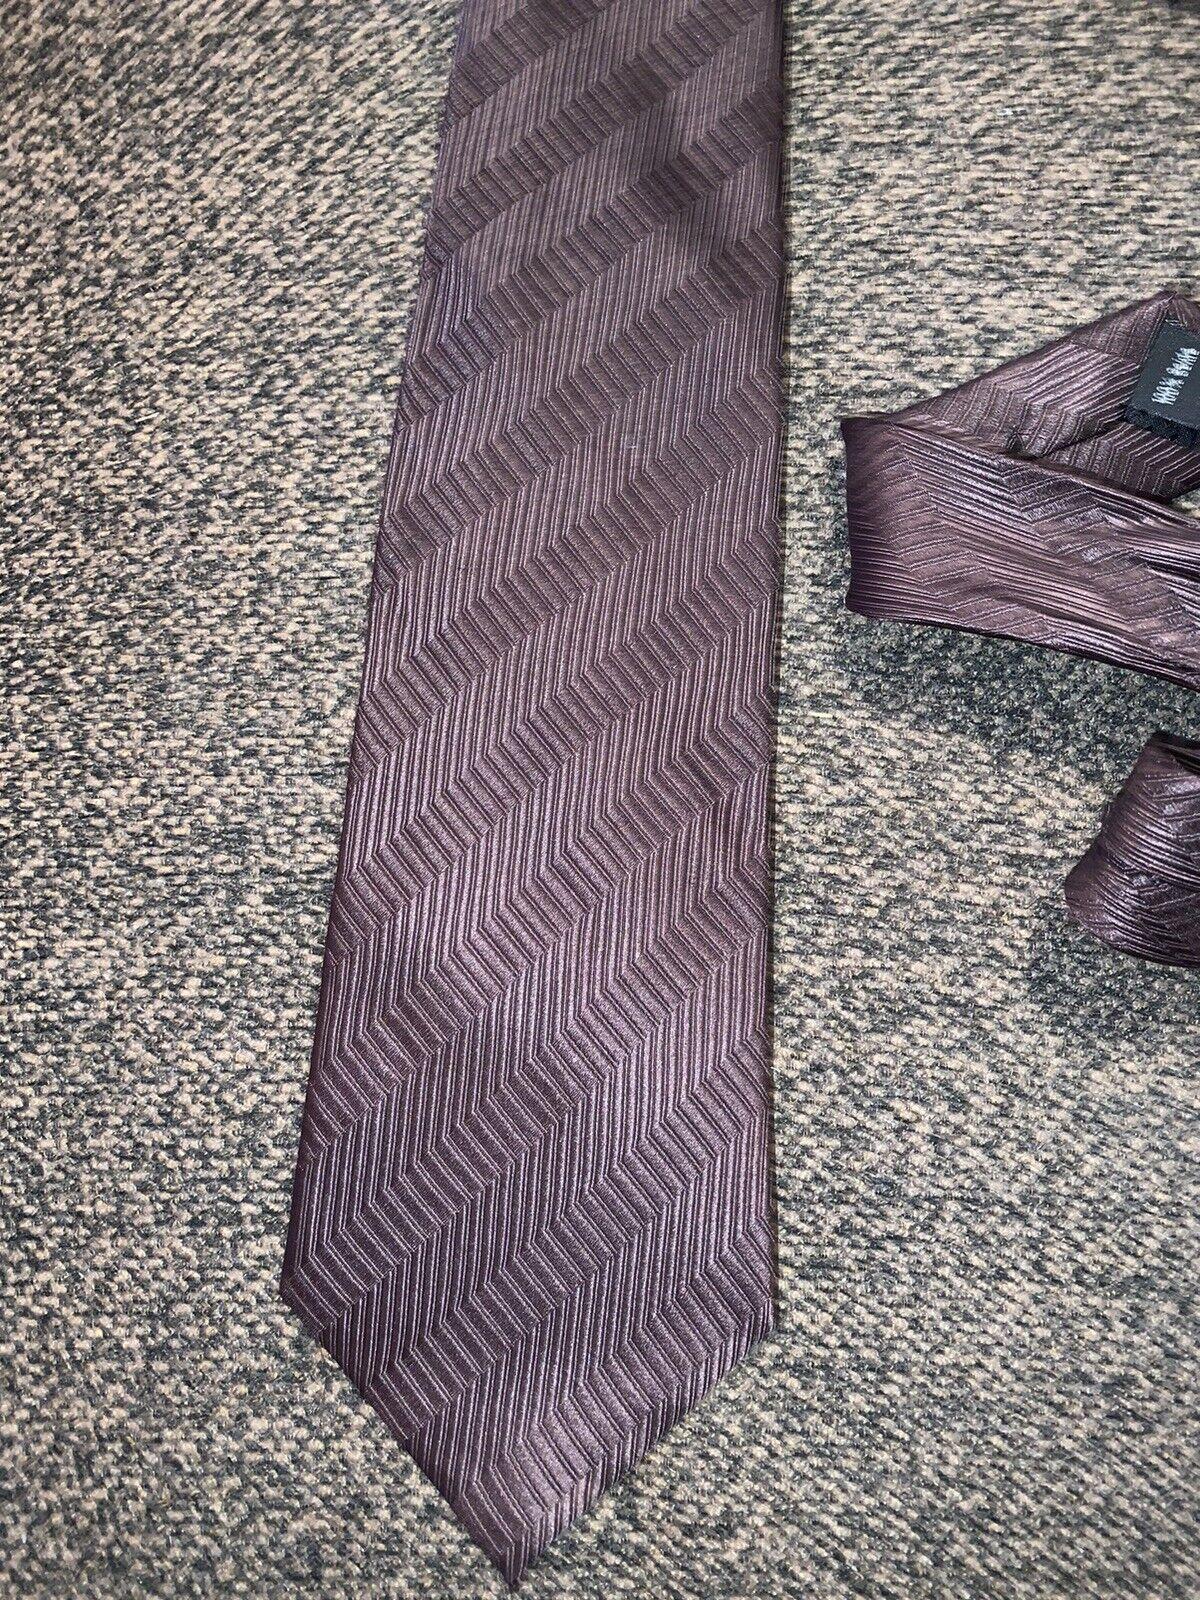 Krawatte 100% Seide Royal Class modern edel braun gemustert